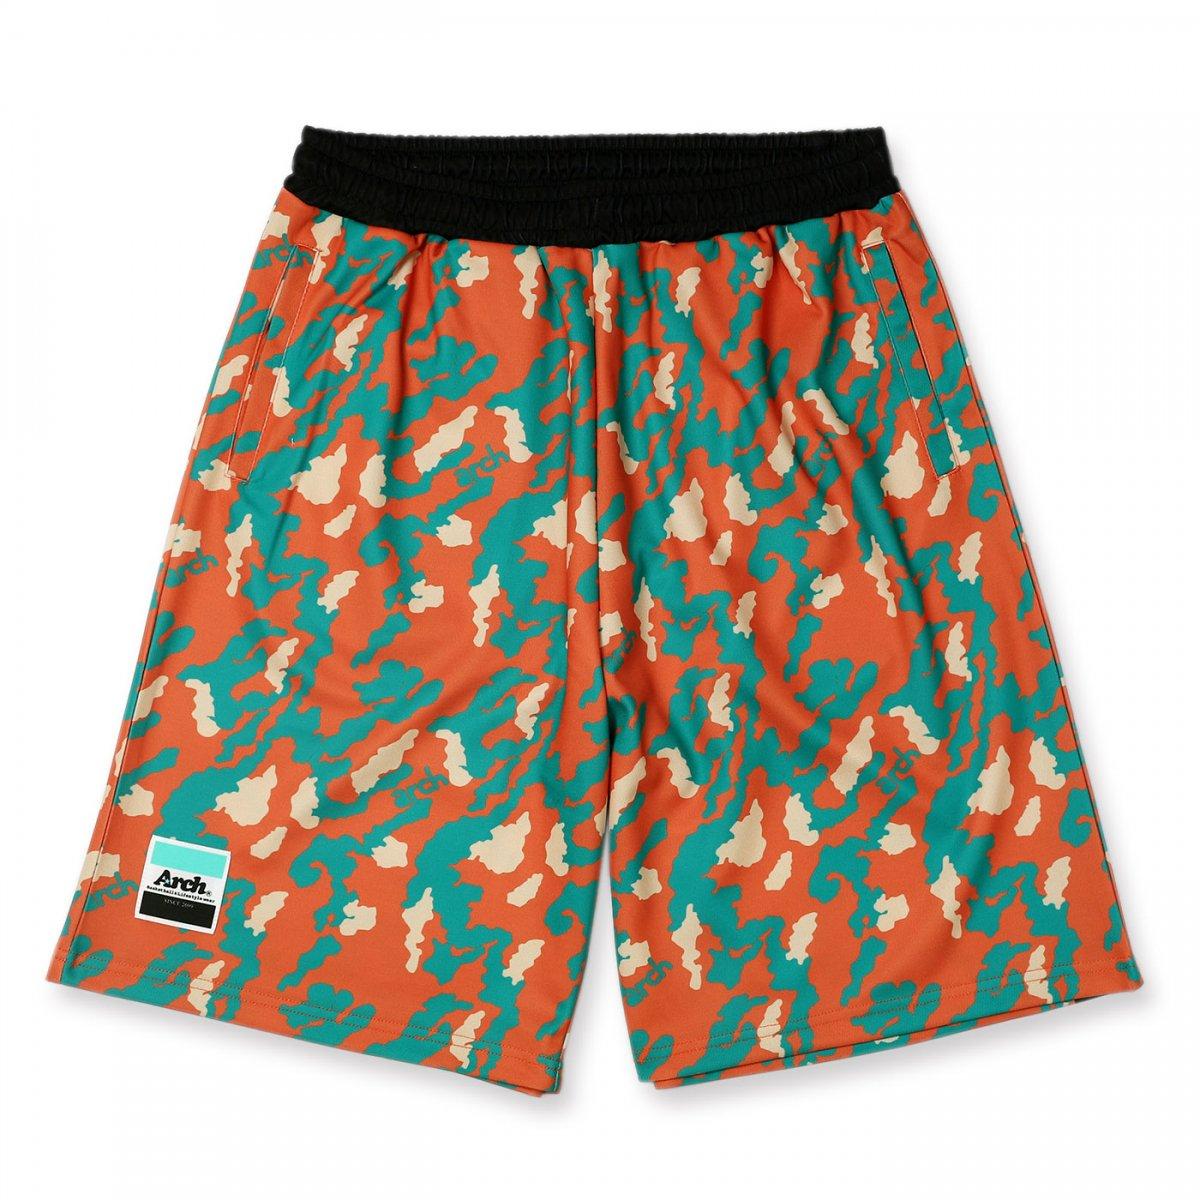 flex camo shorts【coral】